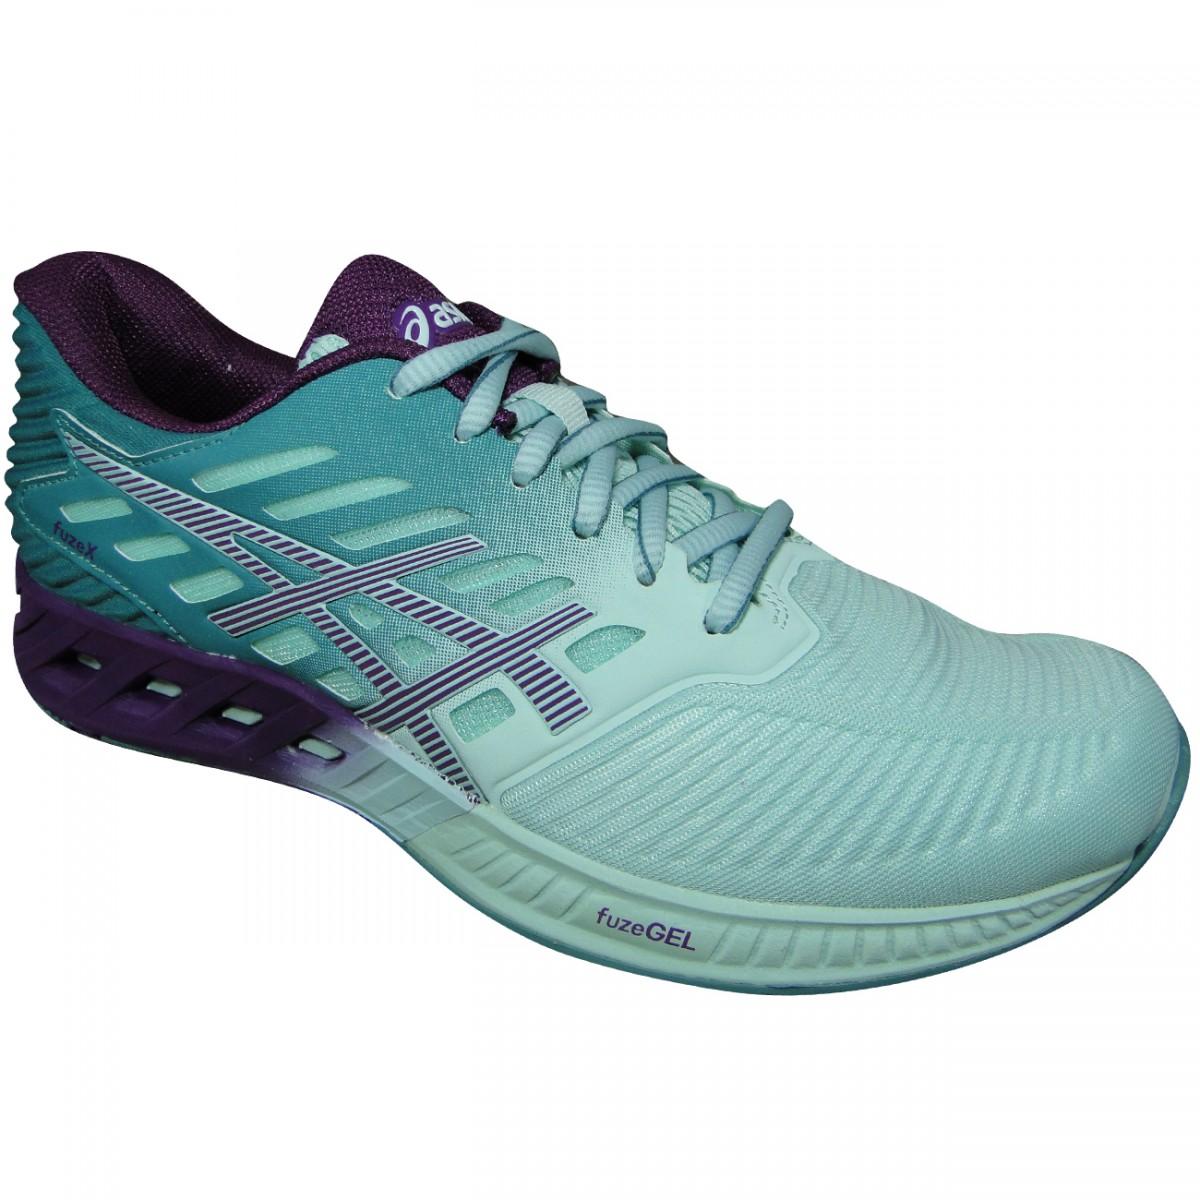 efcdde547dc0b Tenis Asics FuzeX T689N 3933 - Verde Agua Uva - Chuteira Nike ...